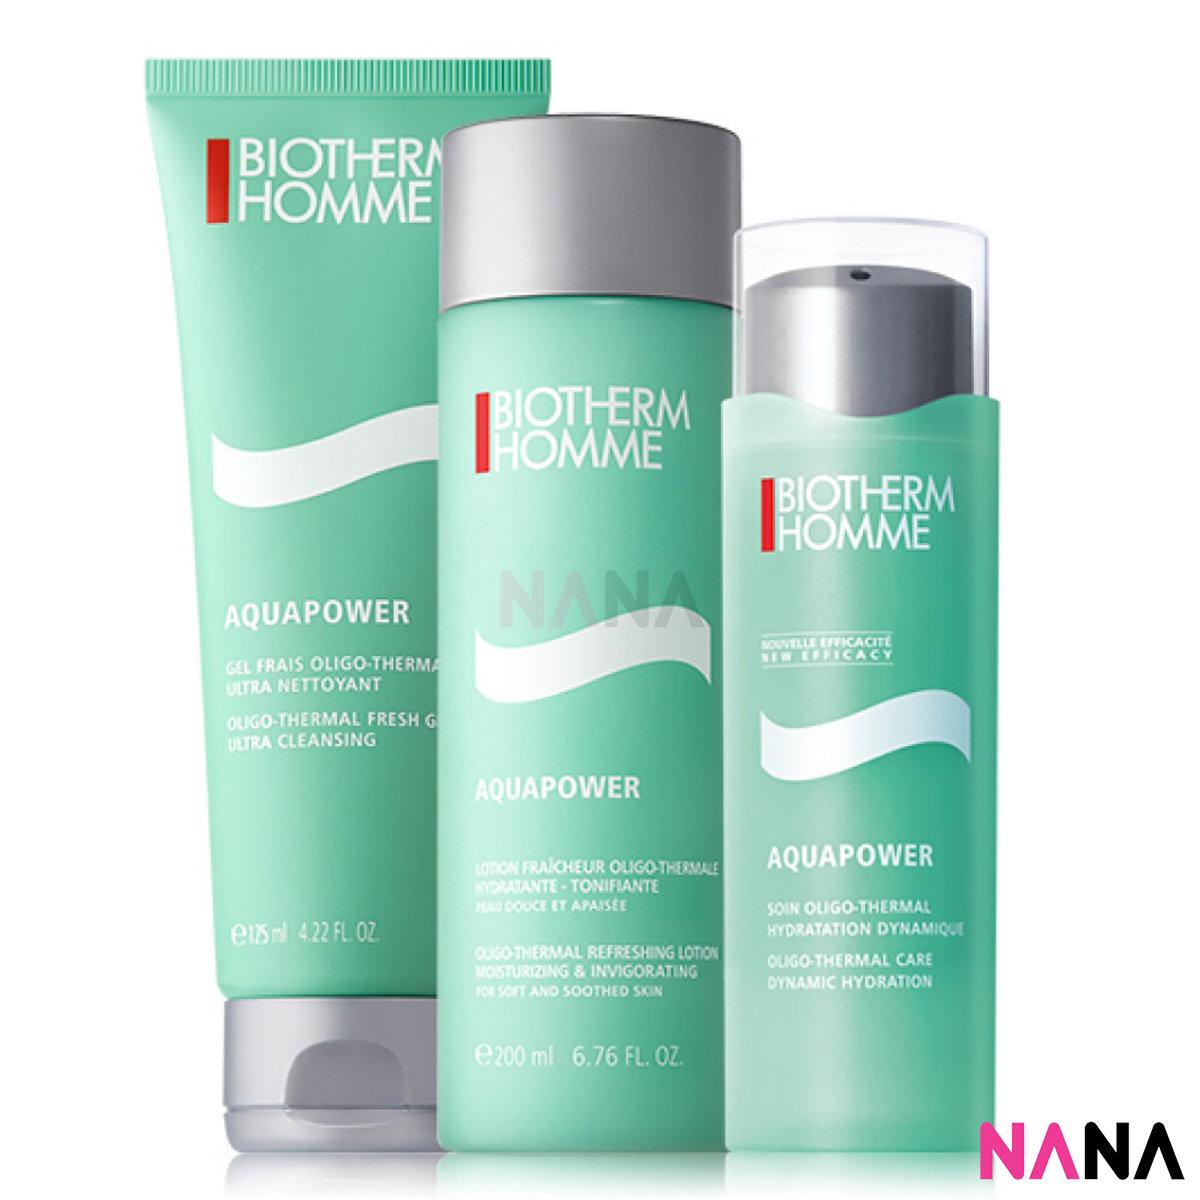 Aquapower Refreshing Skincare Set (3 items)